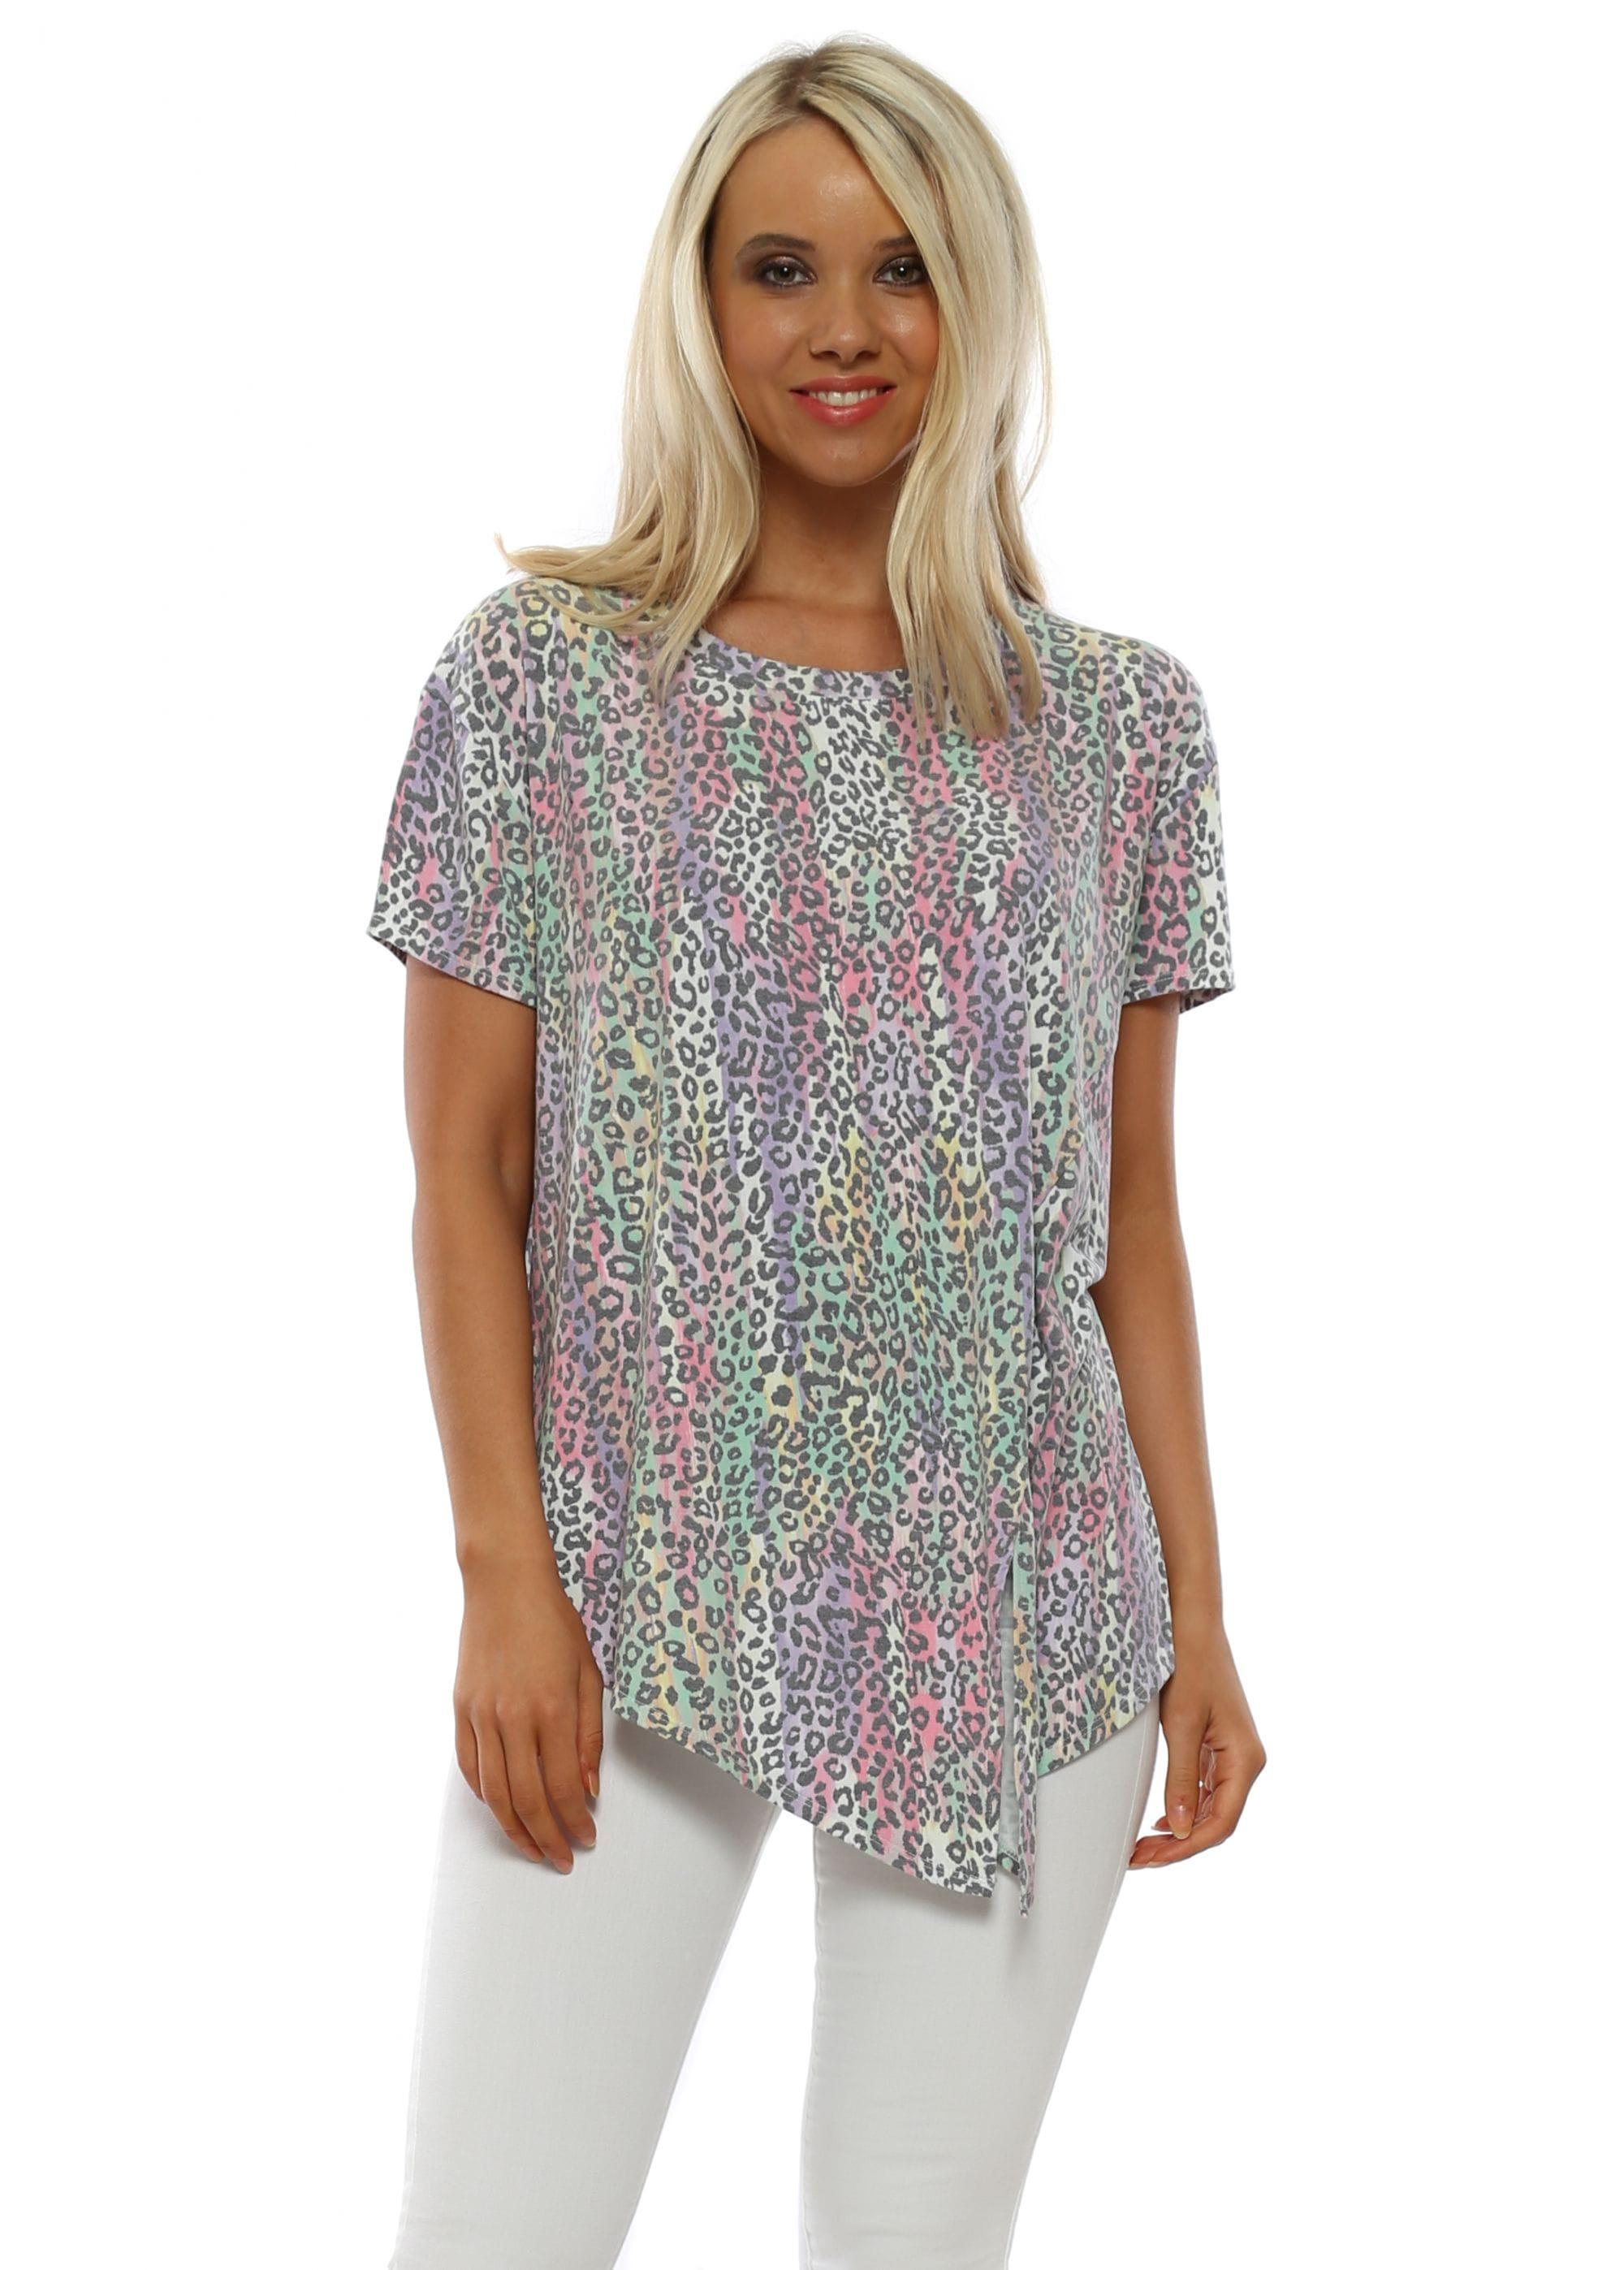 e9db8a52223 Pia Daisy White Rainbow Leopard Tie T-Shirt